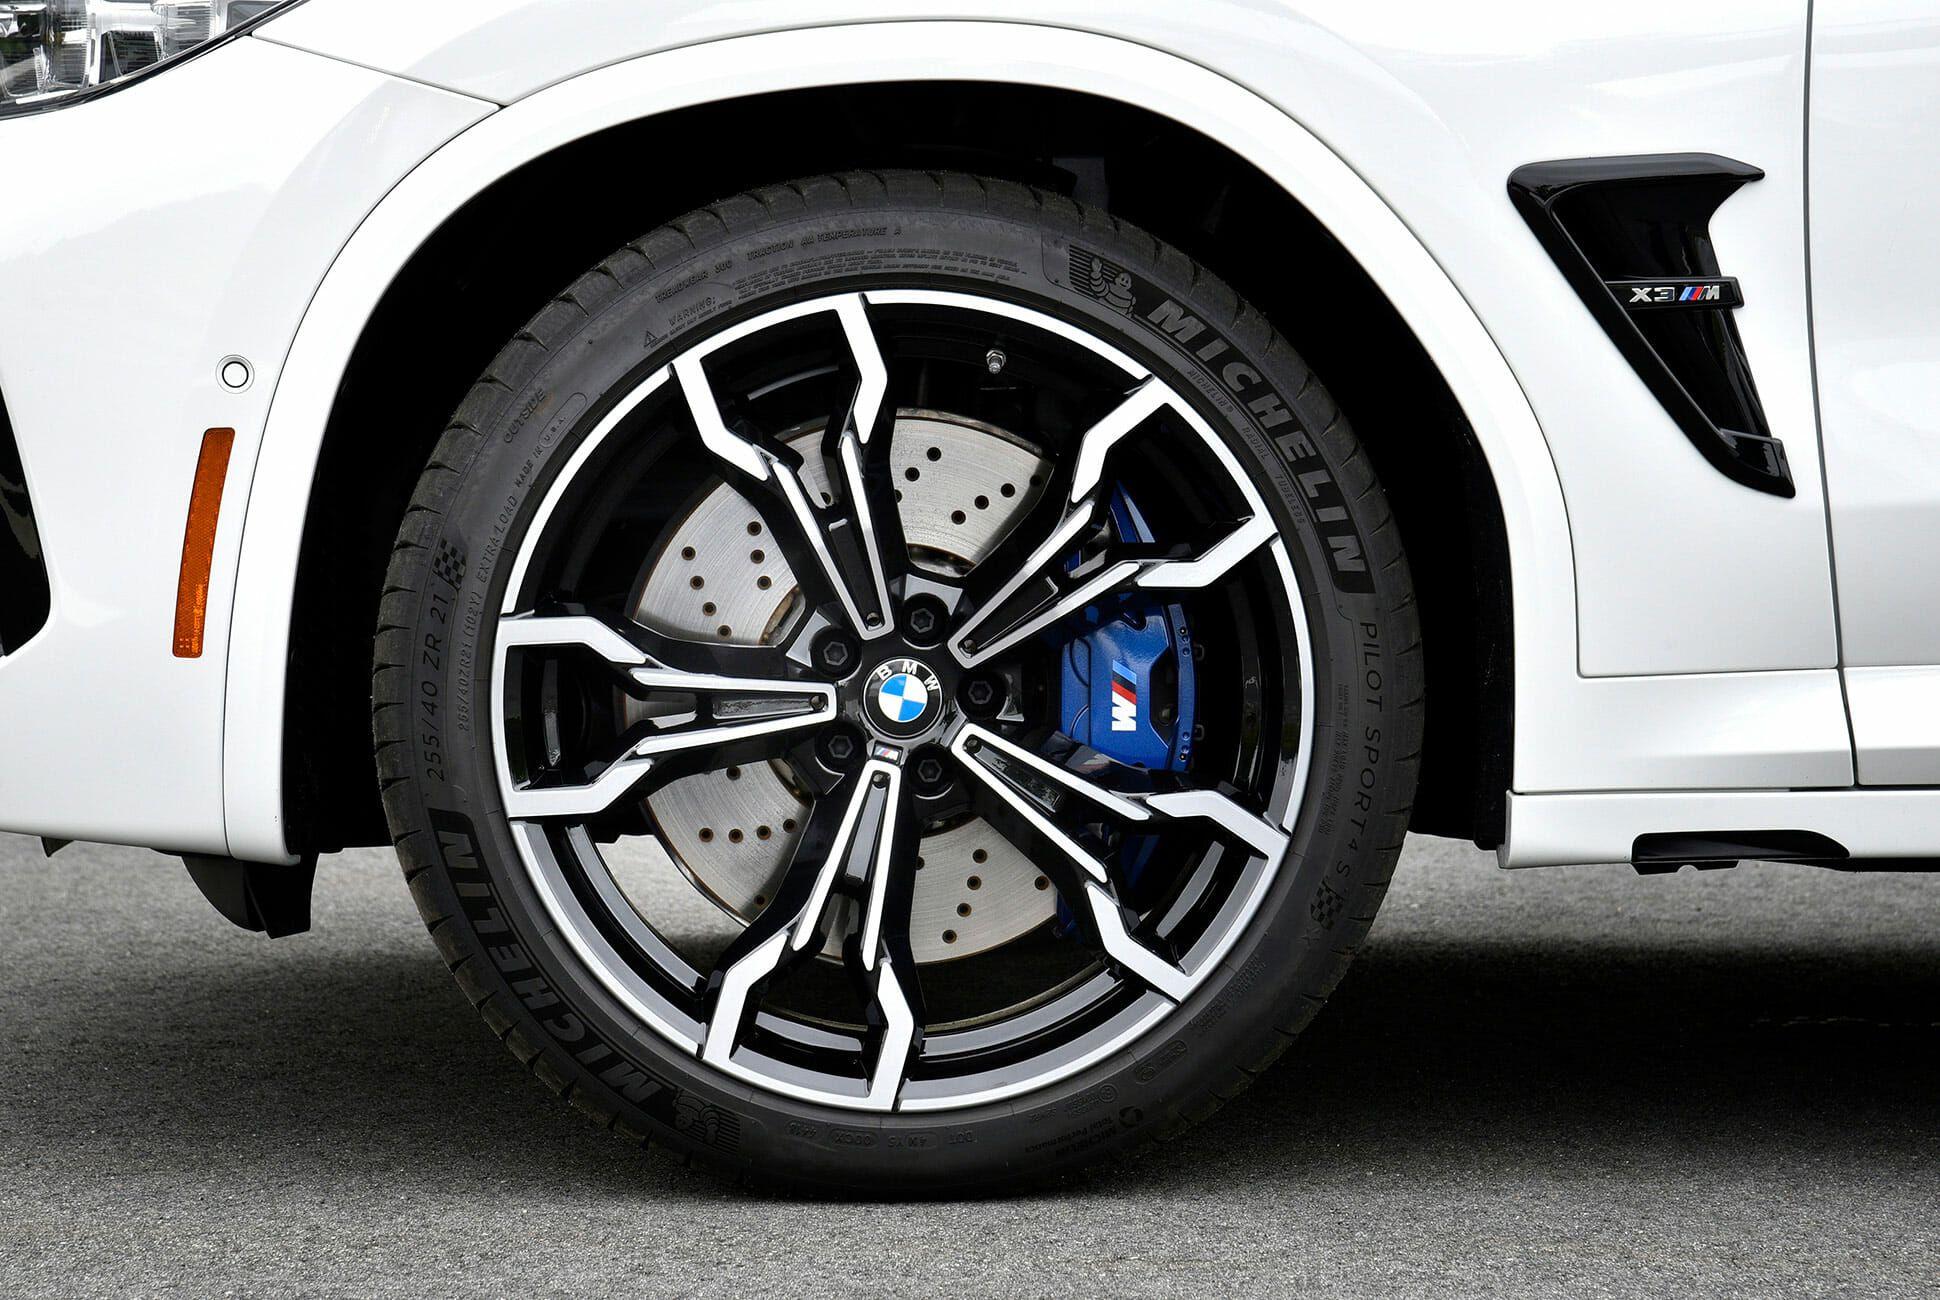 2020-BMW-X3-M-X4-M-Review-gear-patrol-slide-5